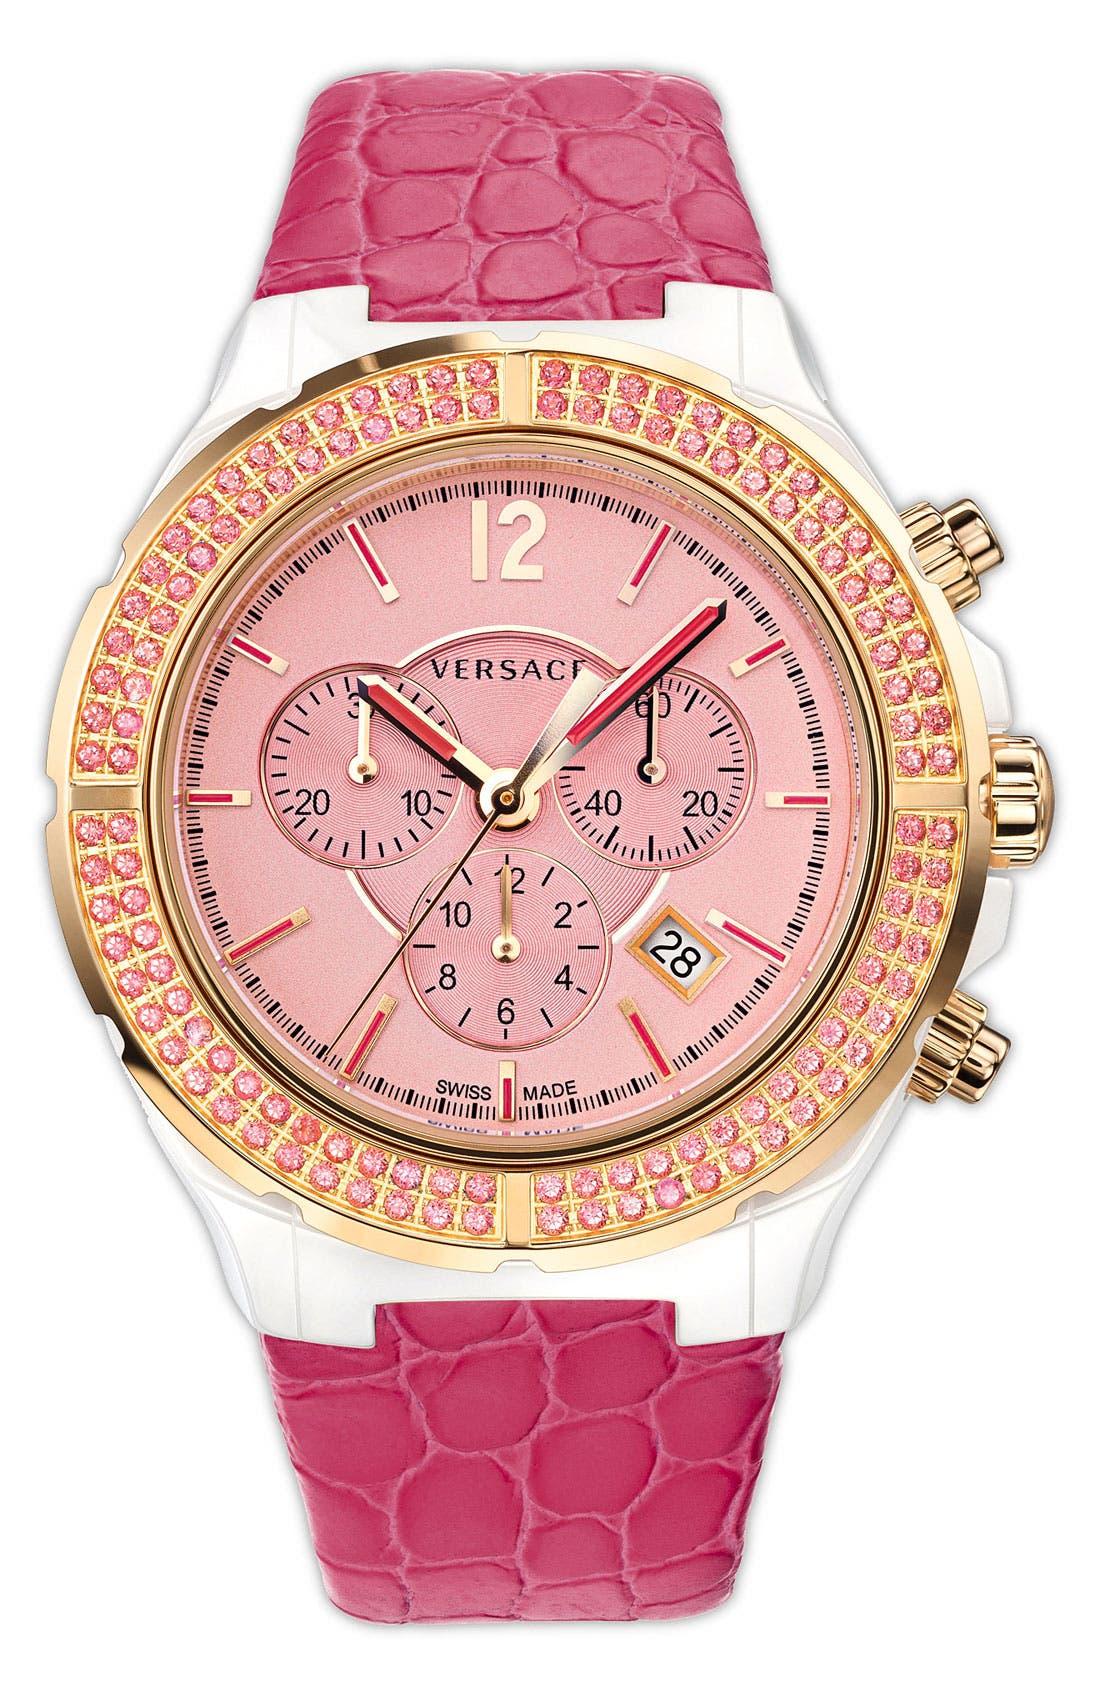 Alternate Image 1 Selected - Versace 'DV One Cruise' Topaz Bezel Watch, 43mm